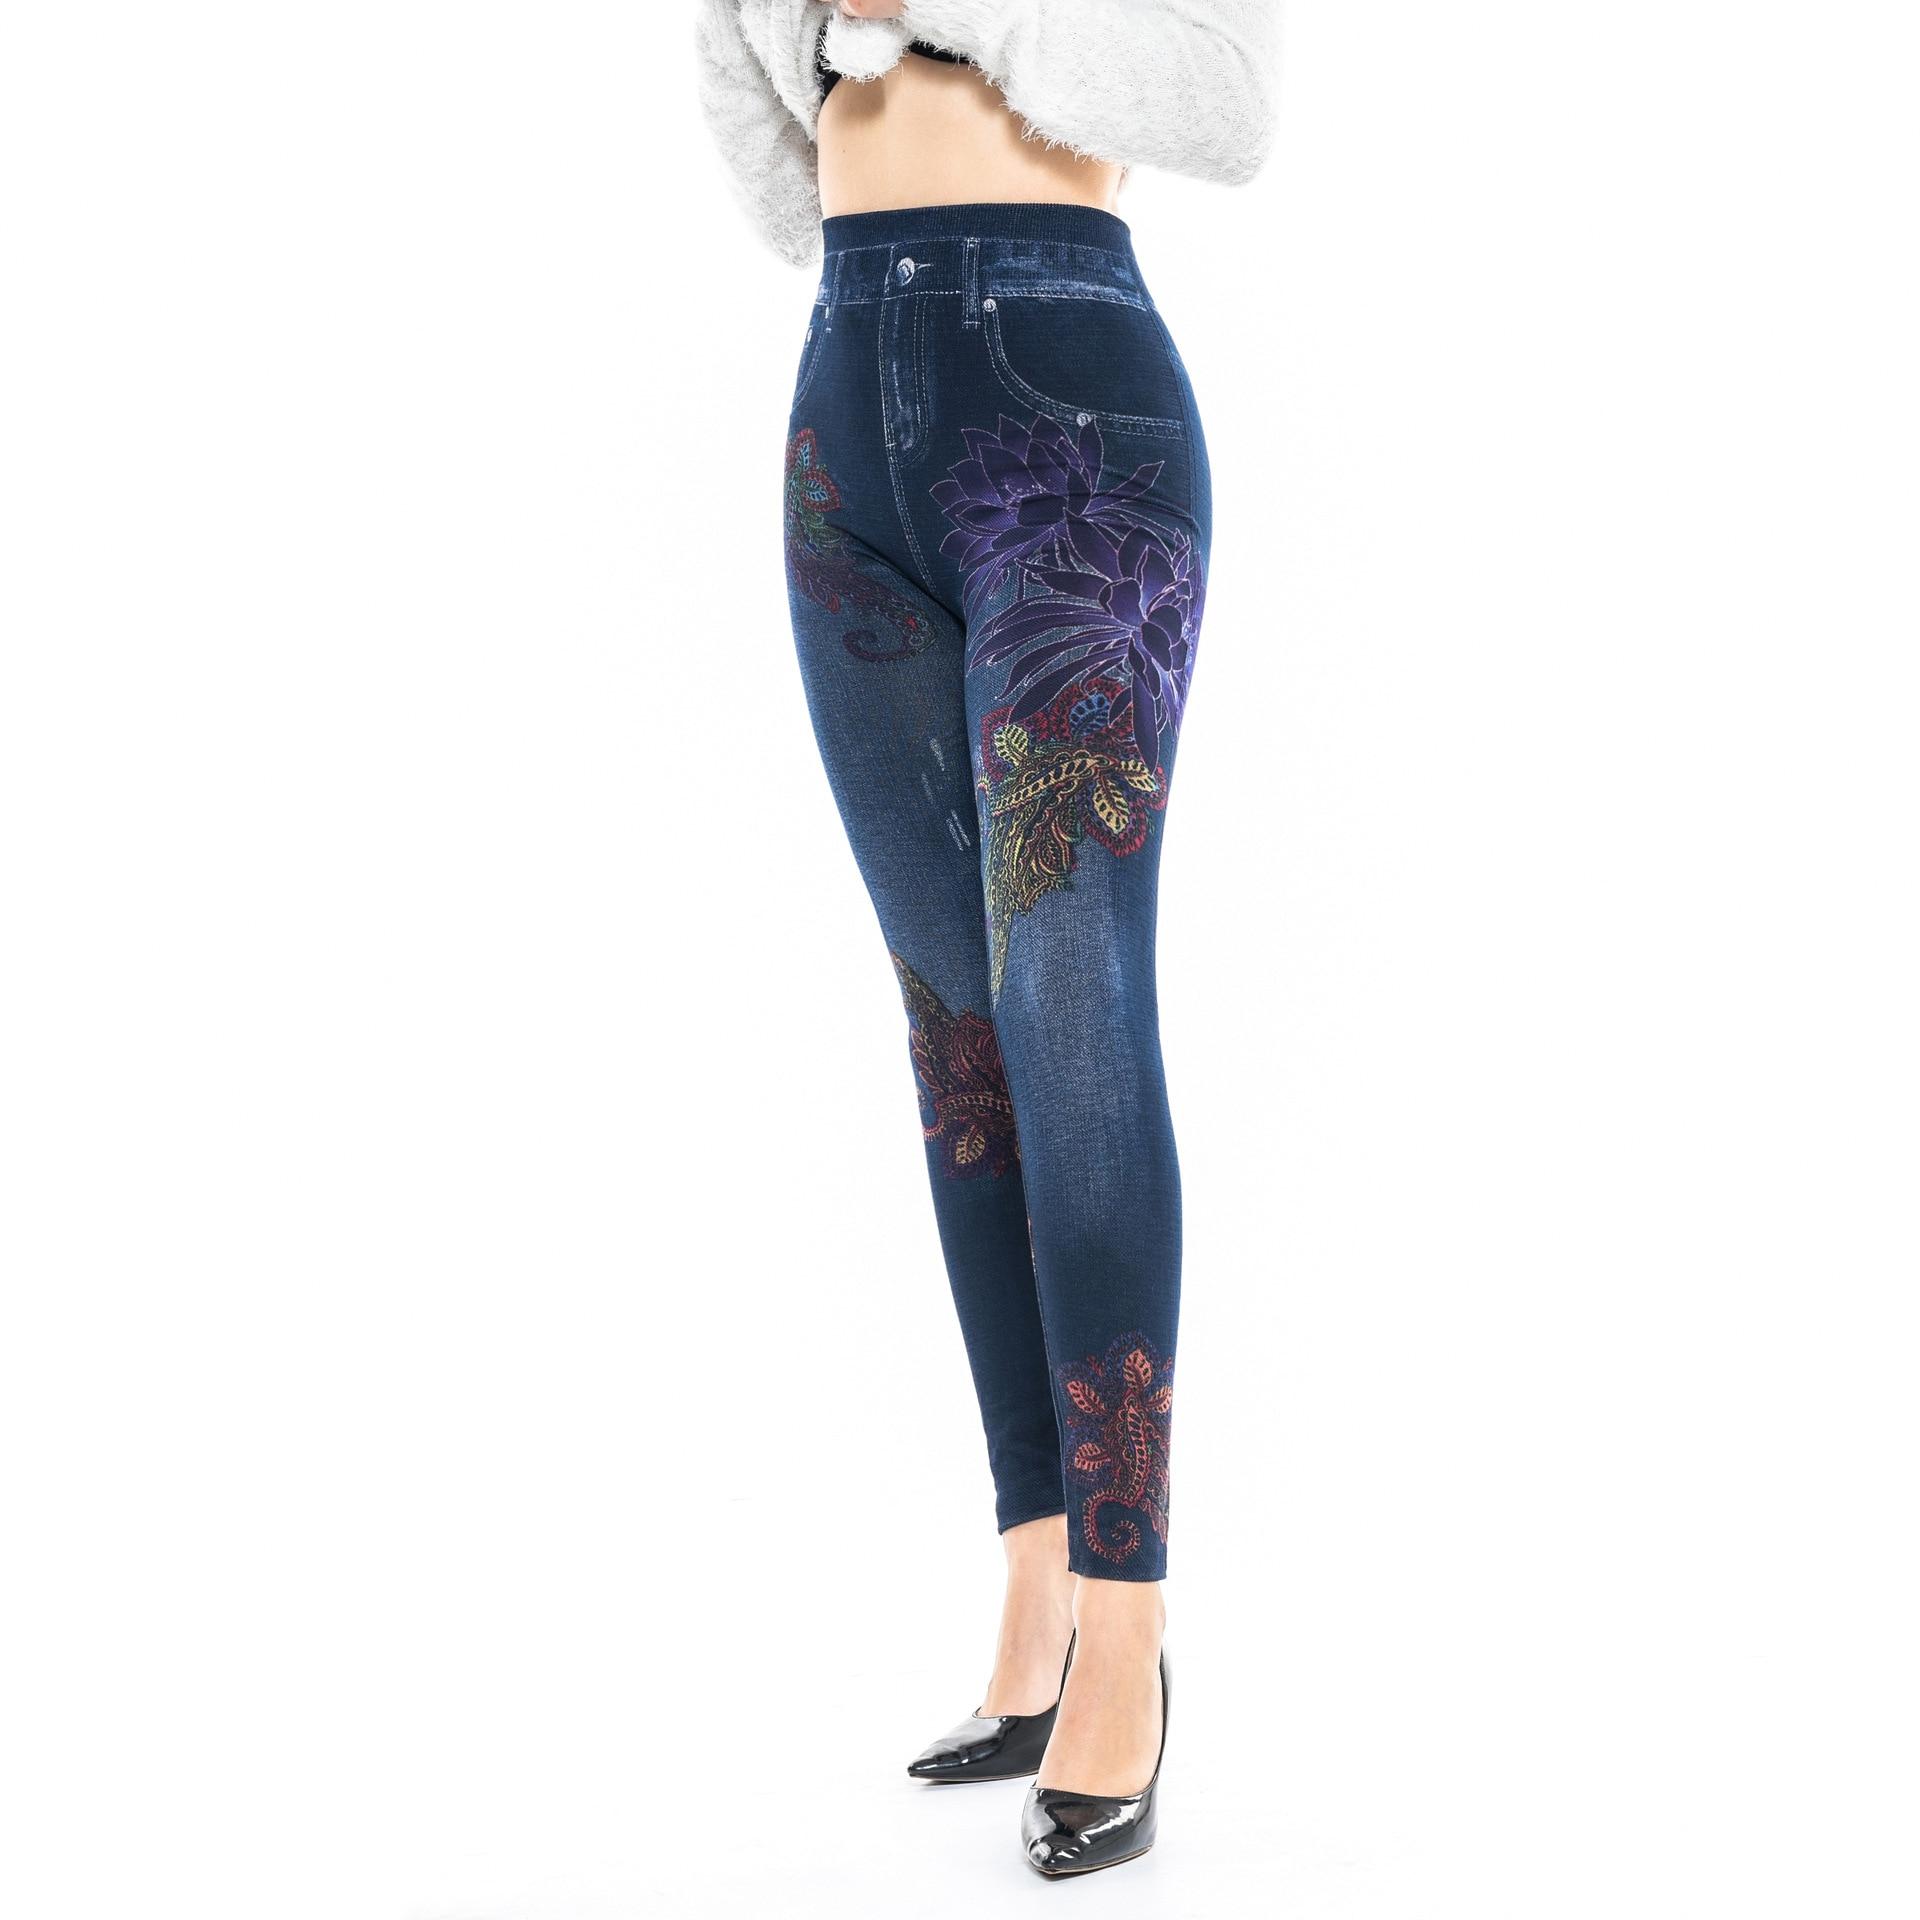 Vorsichtig Faux Denim Jeans Leggings Rot Lotus Print Leggings Frauen Nachahmung Jean Slim Fitness Leggings Elastische Nahtlose Leggins Hosen